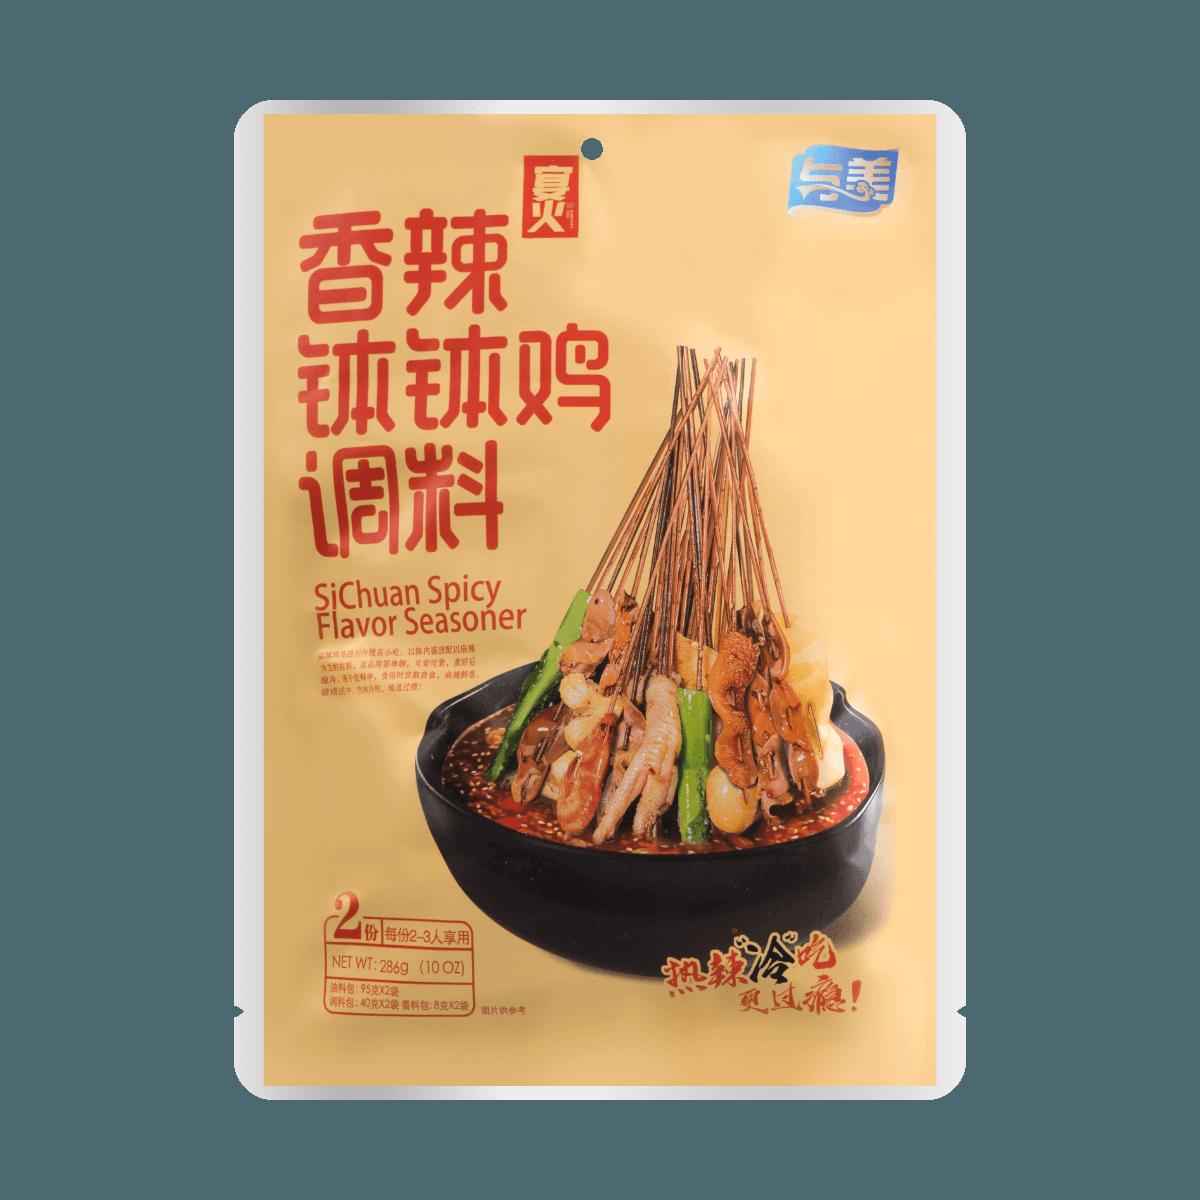 Yamibuy.com:Customer reviews:YUMEI SiChuan Spicy Flavor Seasoner 286g